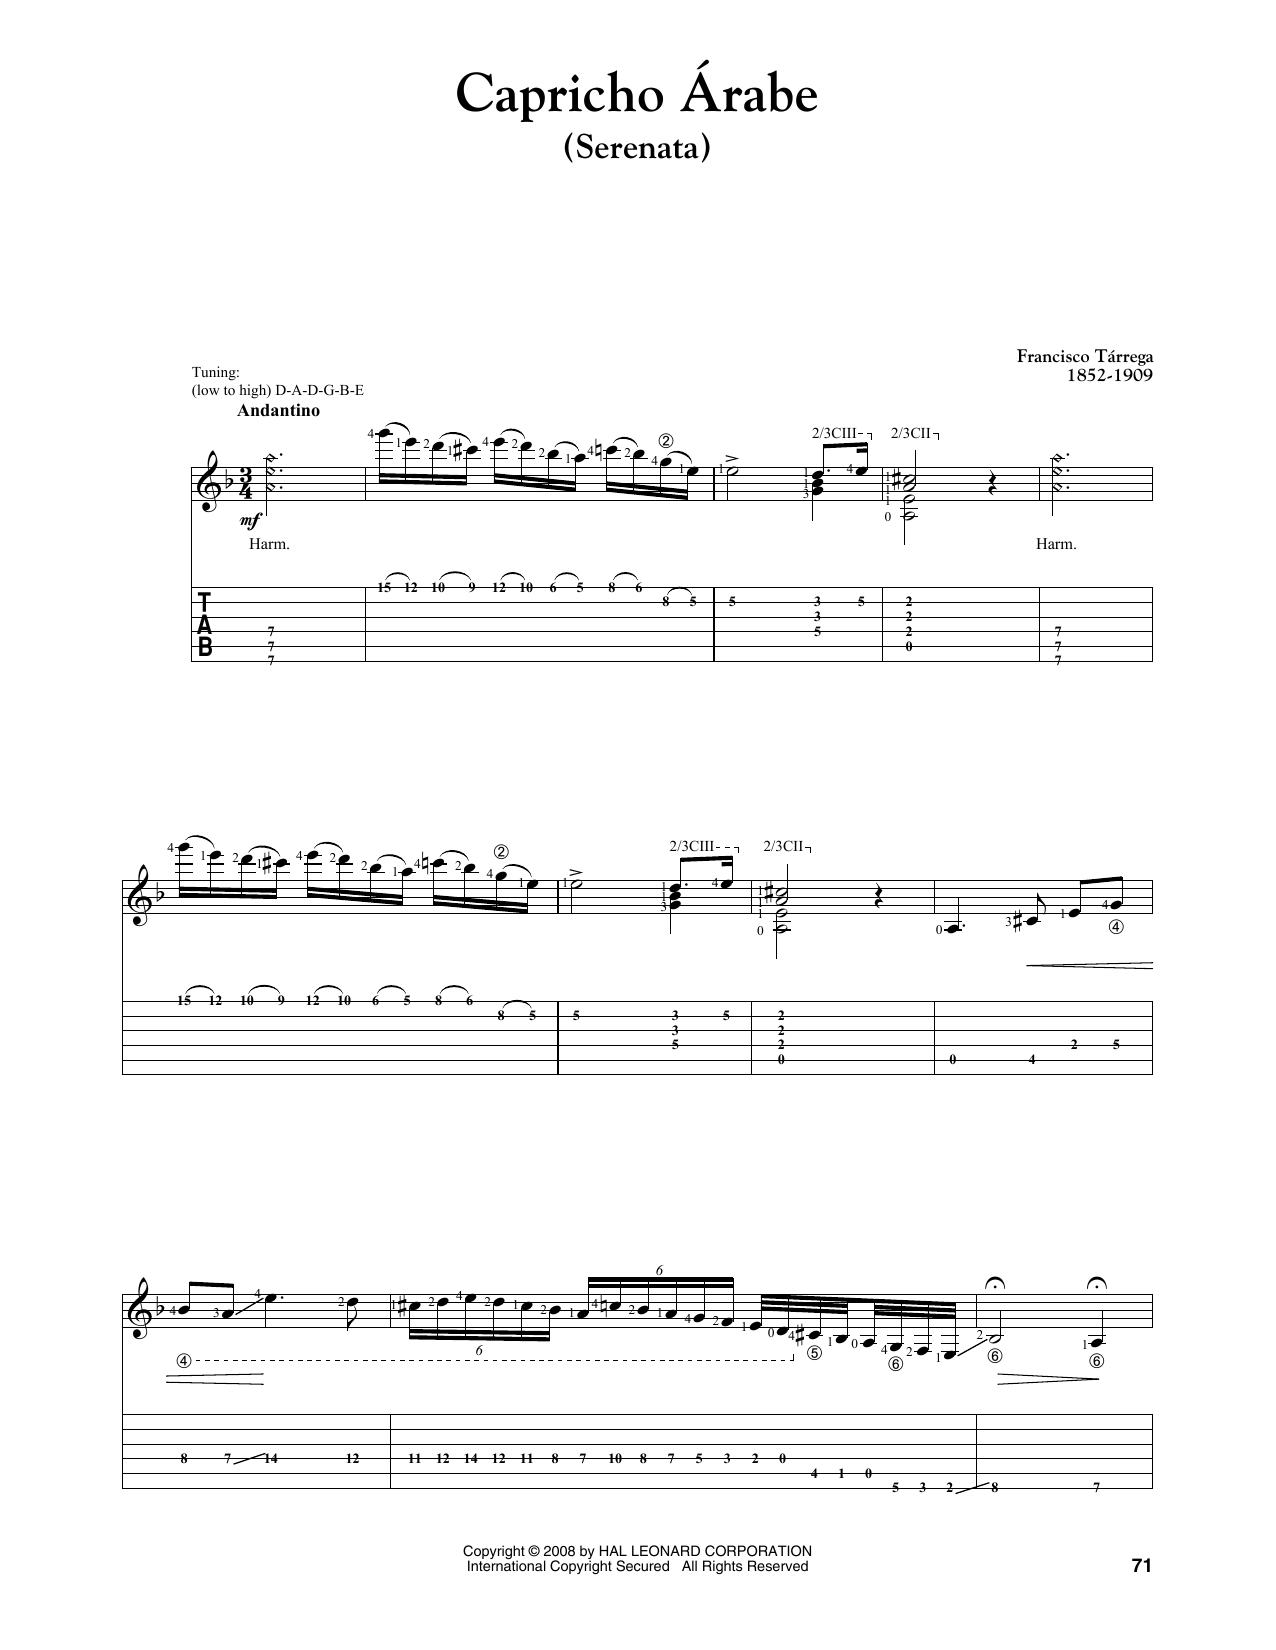 Capricho Arabe (Serenata) Sheet Music | Francisco Tarrega ...